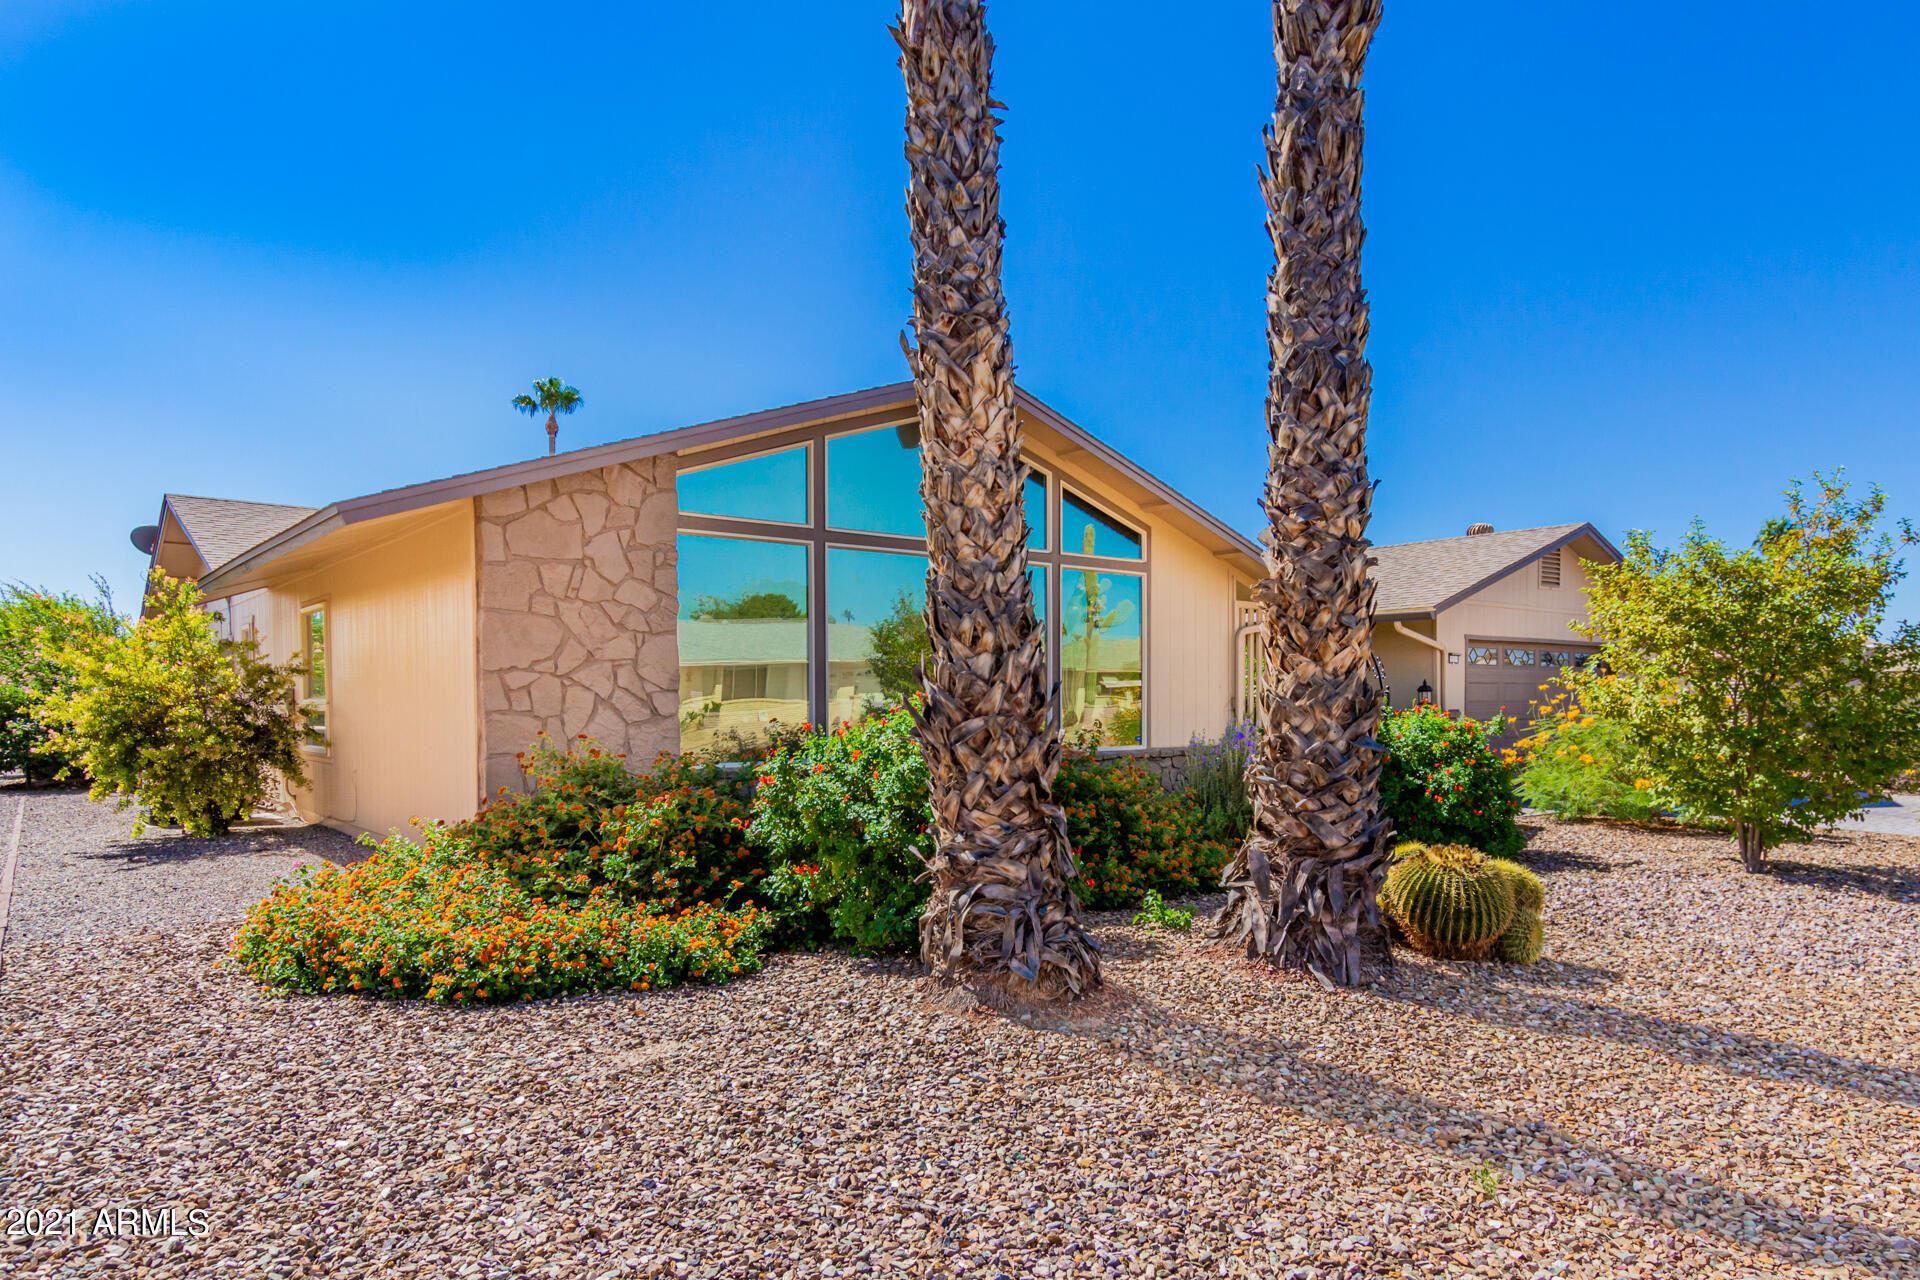 Photo of 10619 W DESERT ROCK Drive, Sun City, AZ 85351 (MLS # 6303709)